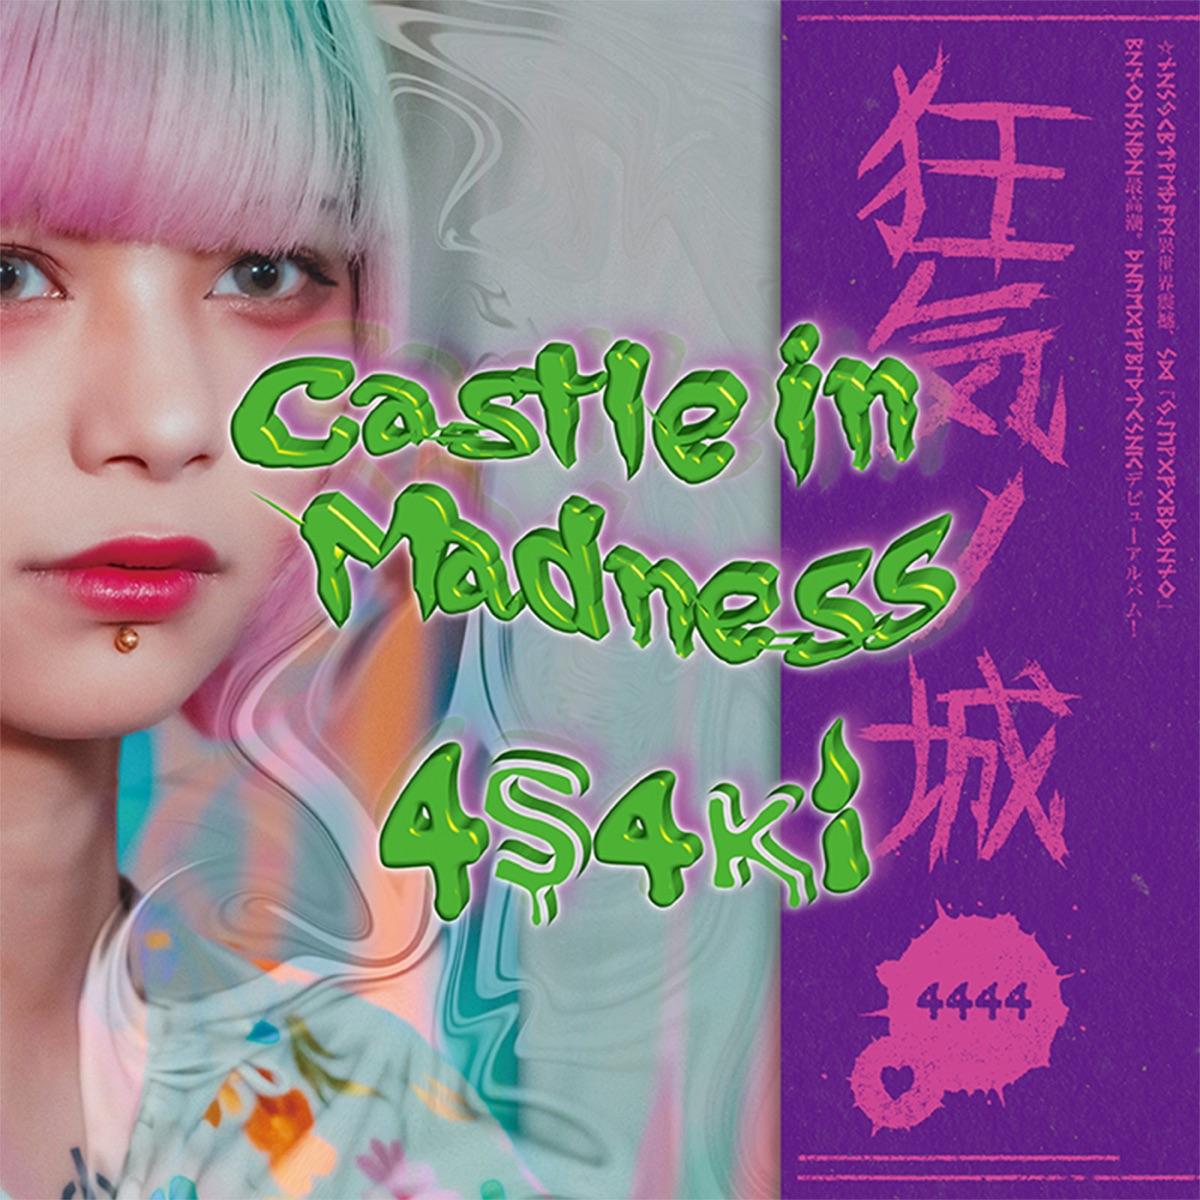 『4s4ki - STAR PLAYER』収録の『Castle in Madness』ジャケット